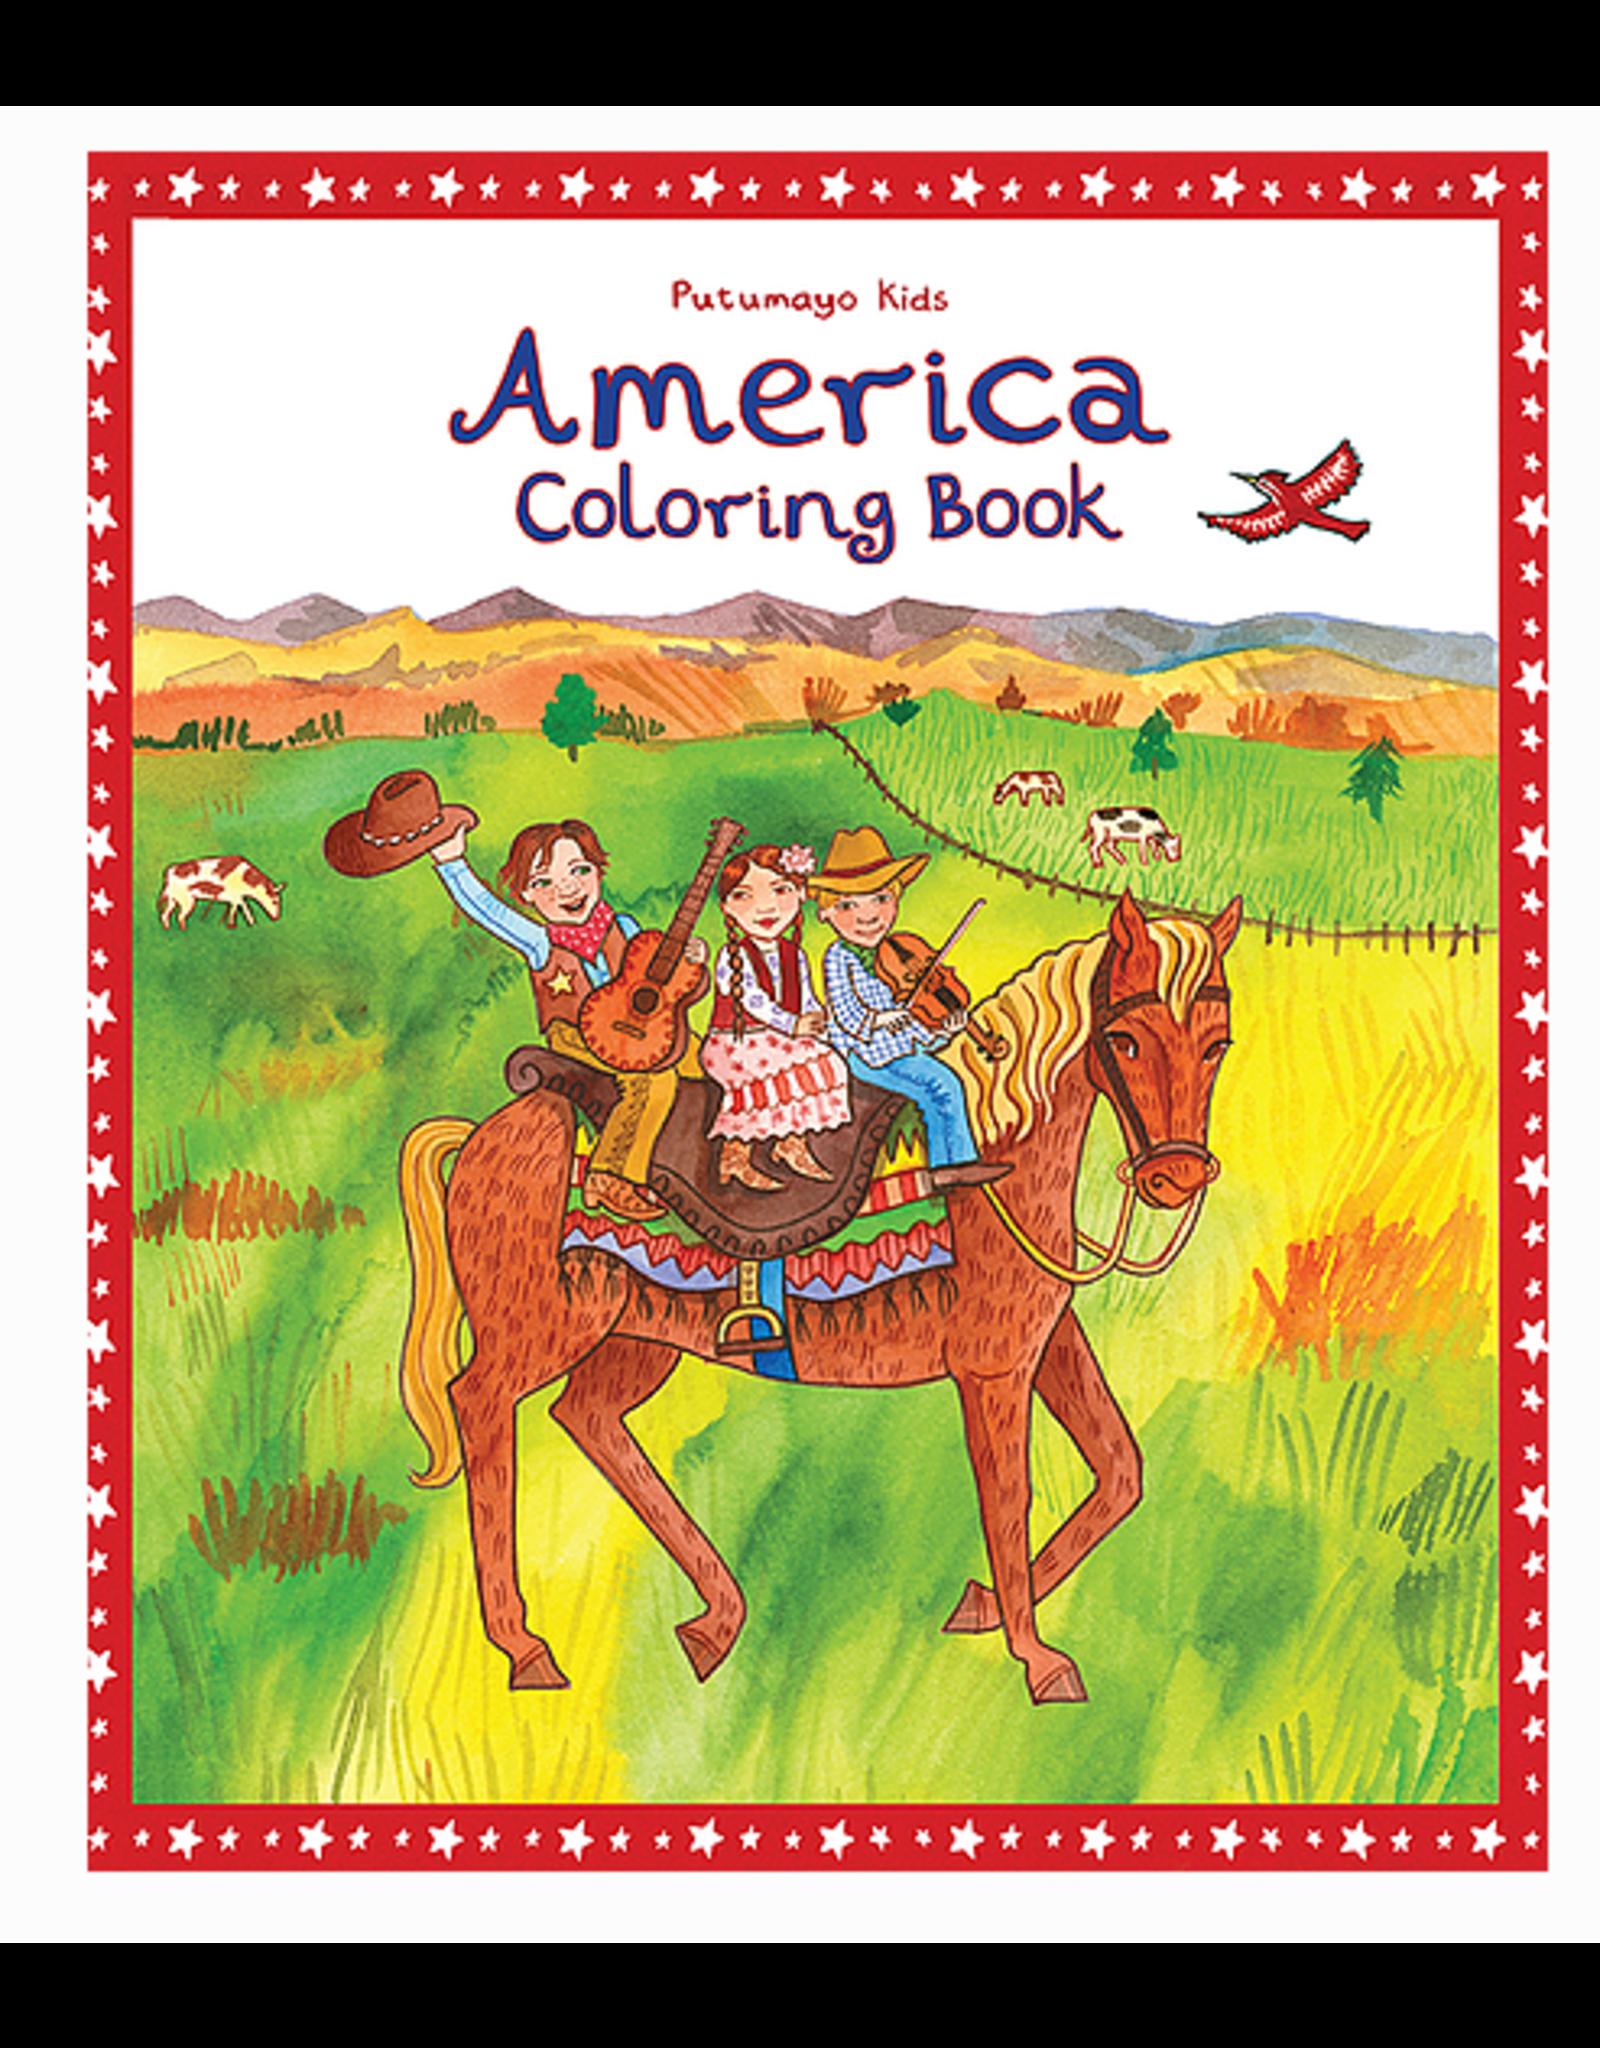 Putumayo Coloring Book America